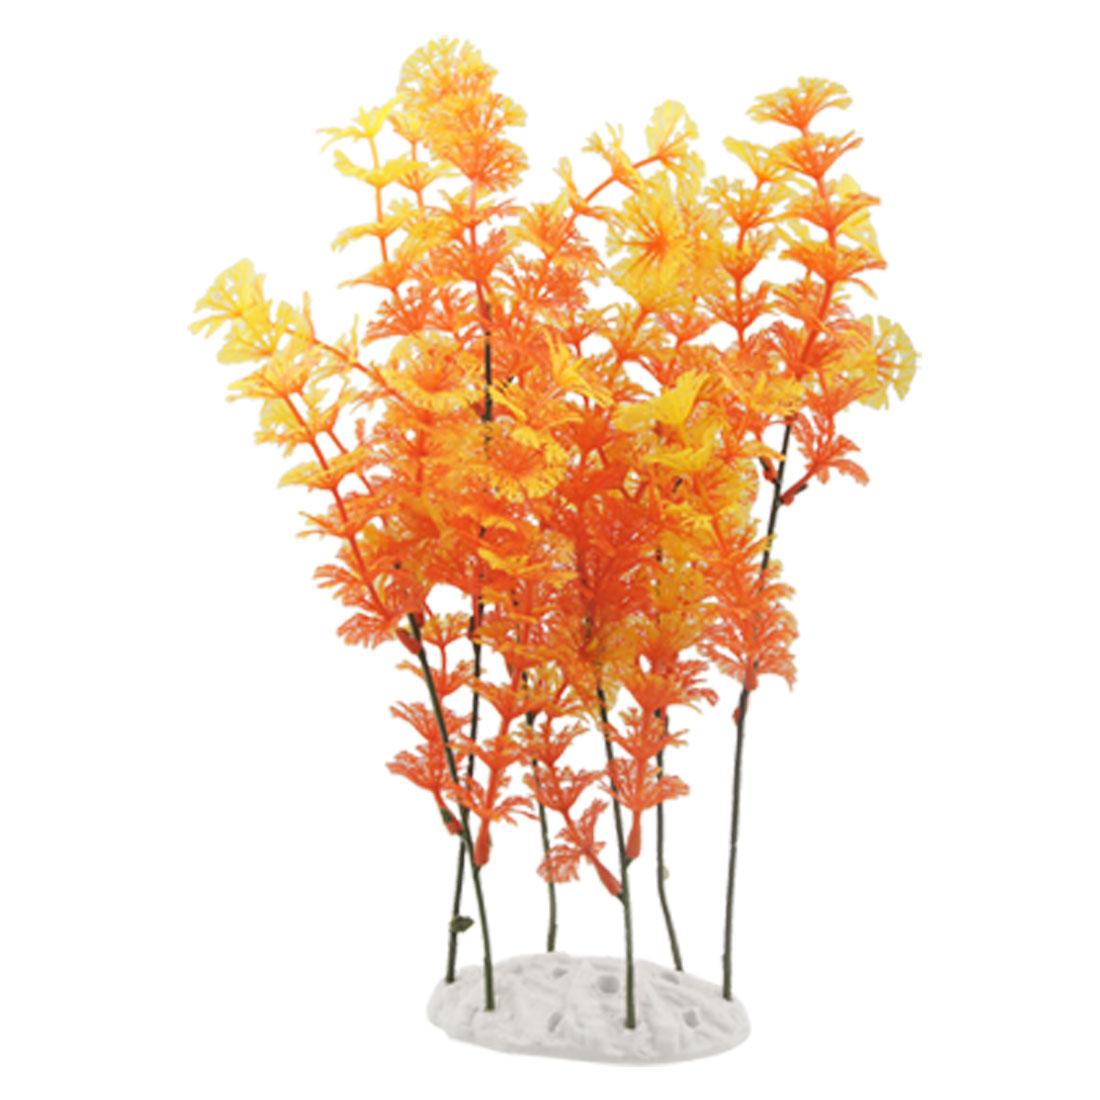 Fish Tank 29cm Height Orange Aquascaping Plants Ornament